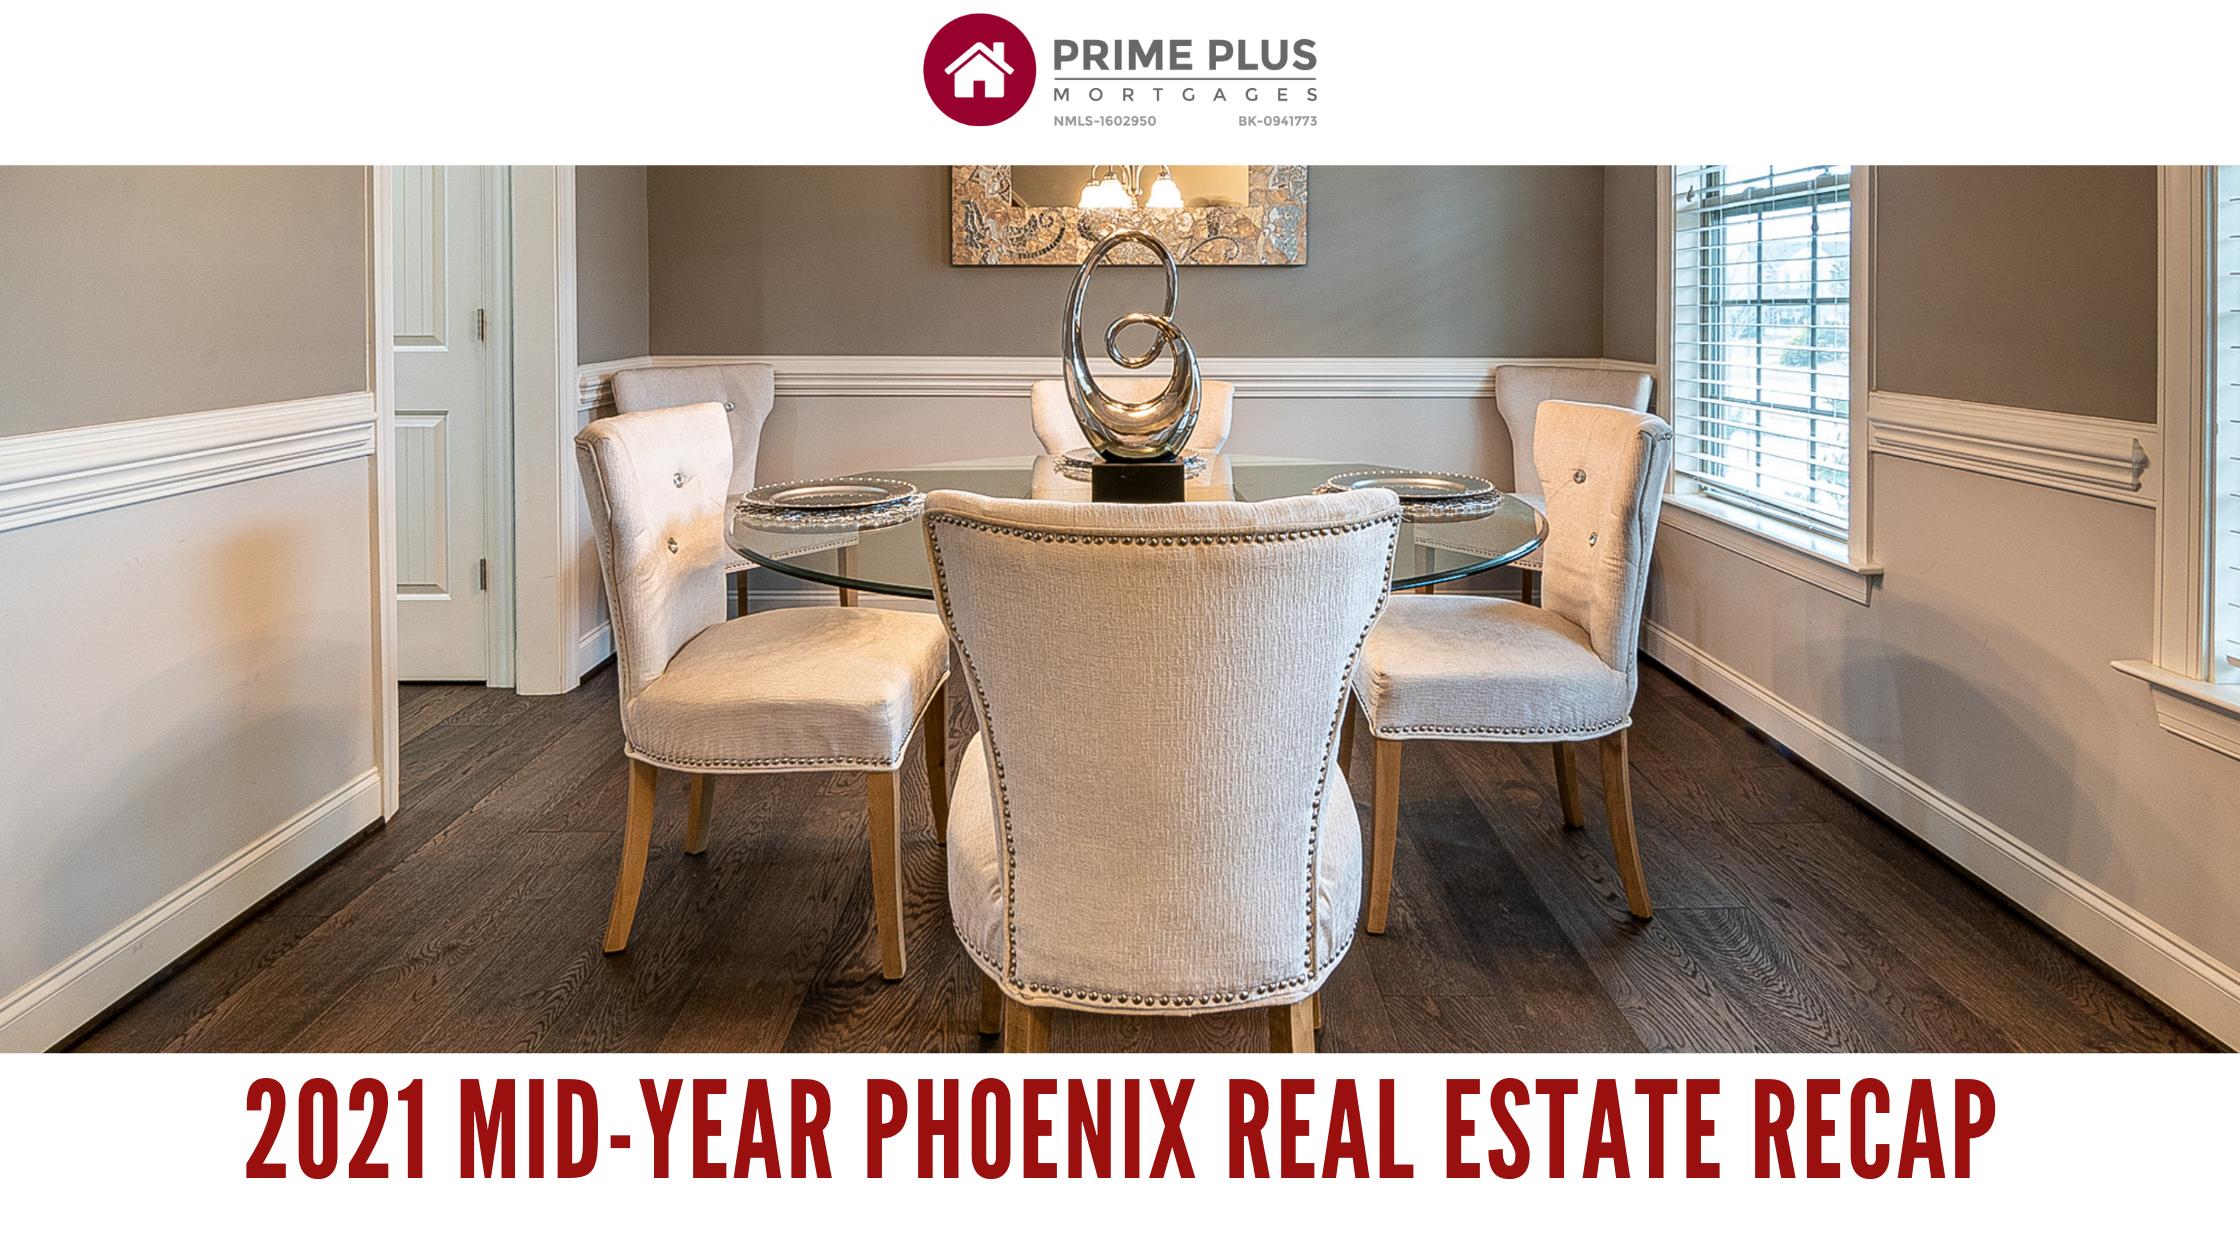 2021 Mid-Year Phoenix Real Estate Recap